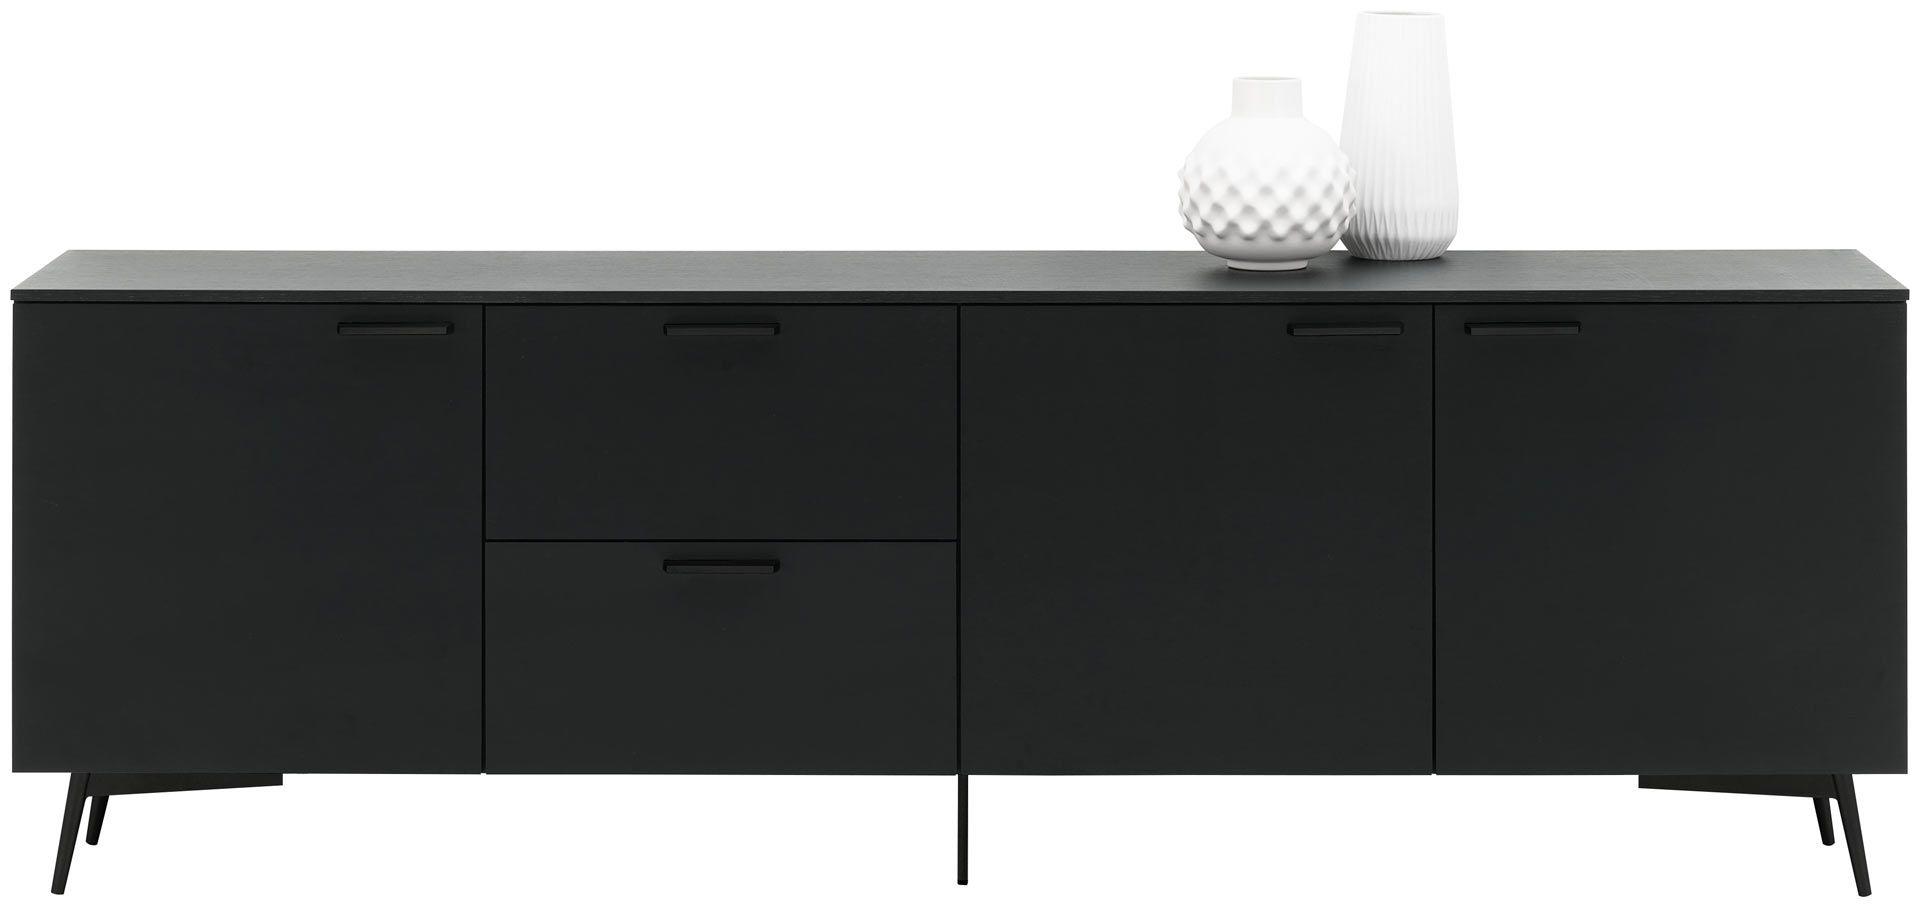 Boconcept Occa Sideboard Contemporary Sideboard Modern